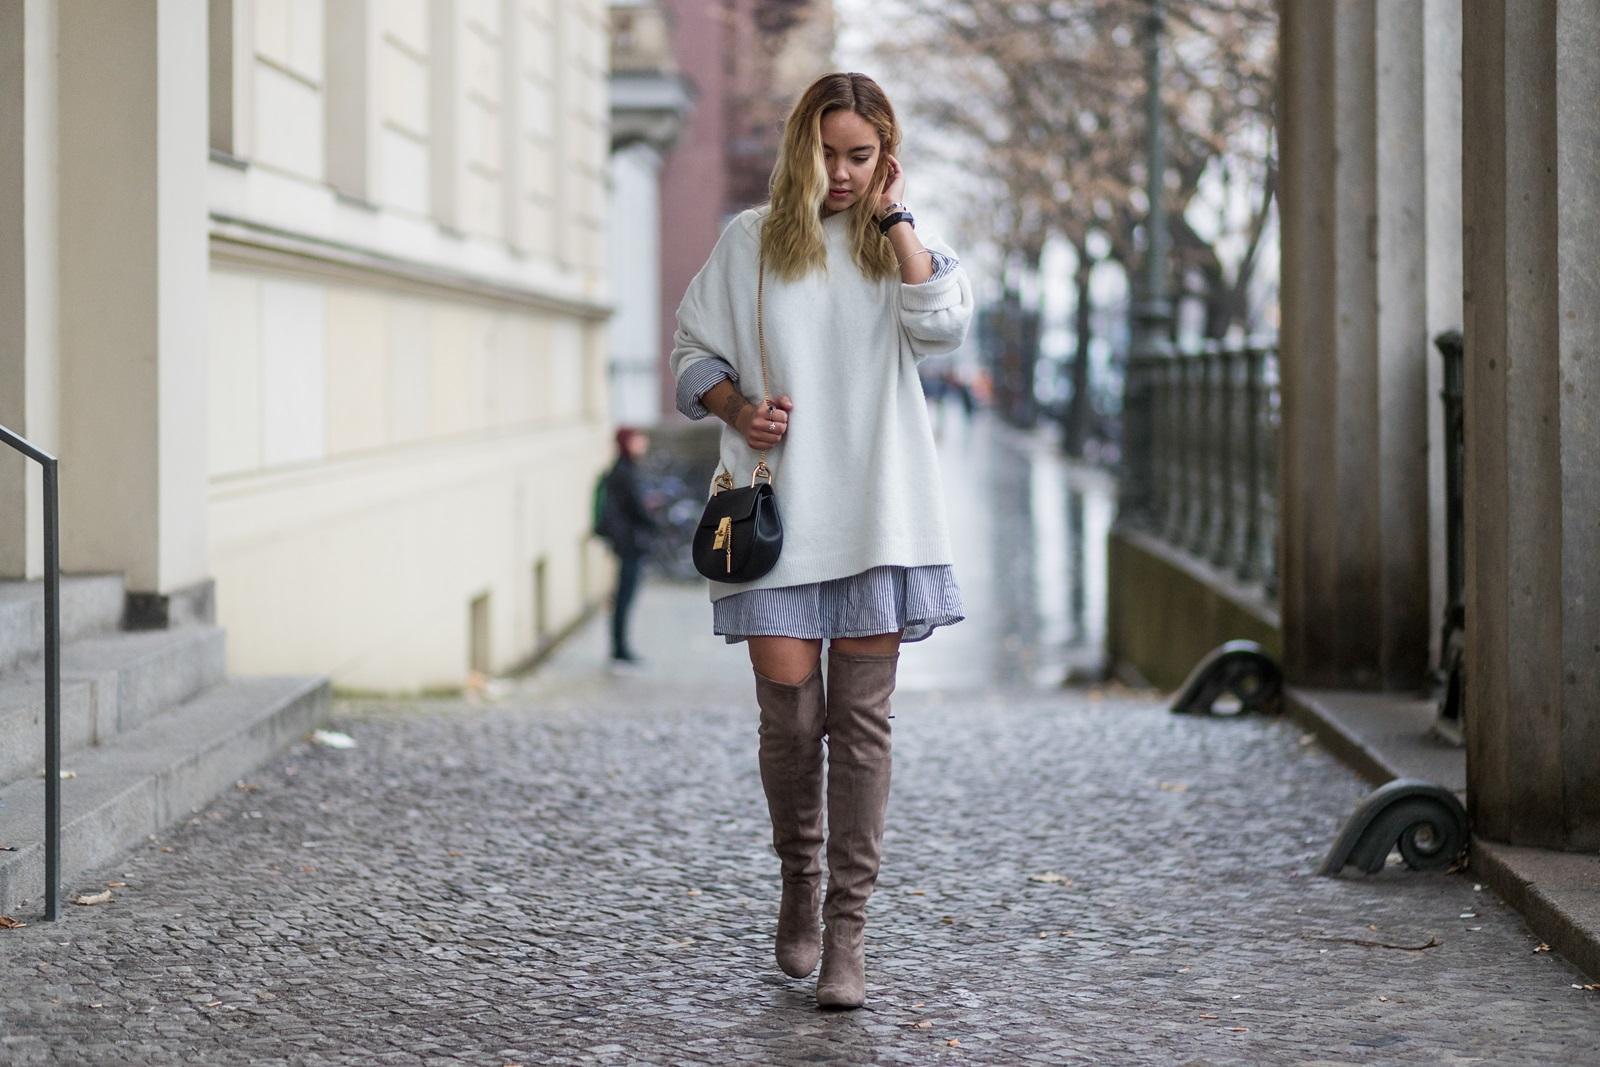 beispiellos großer Rabatt angenehmes Gefühl HOW TO STYLE OVERKNEES - Fashionzire